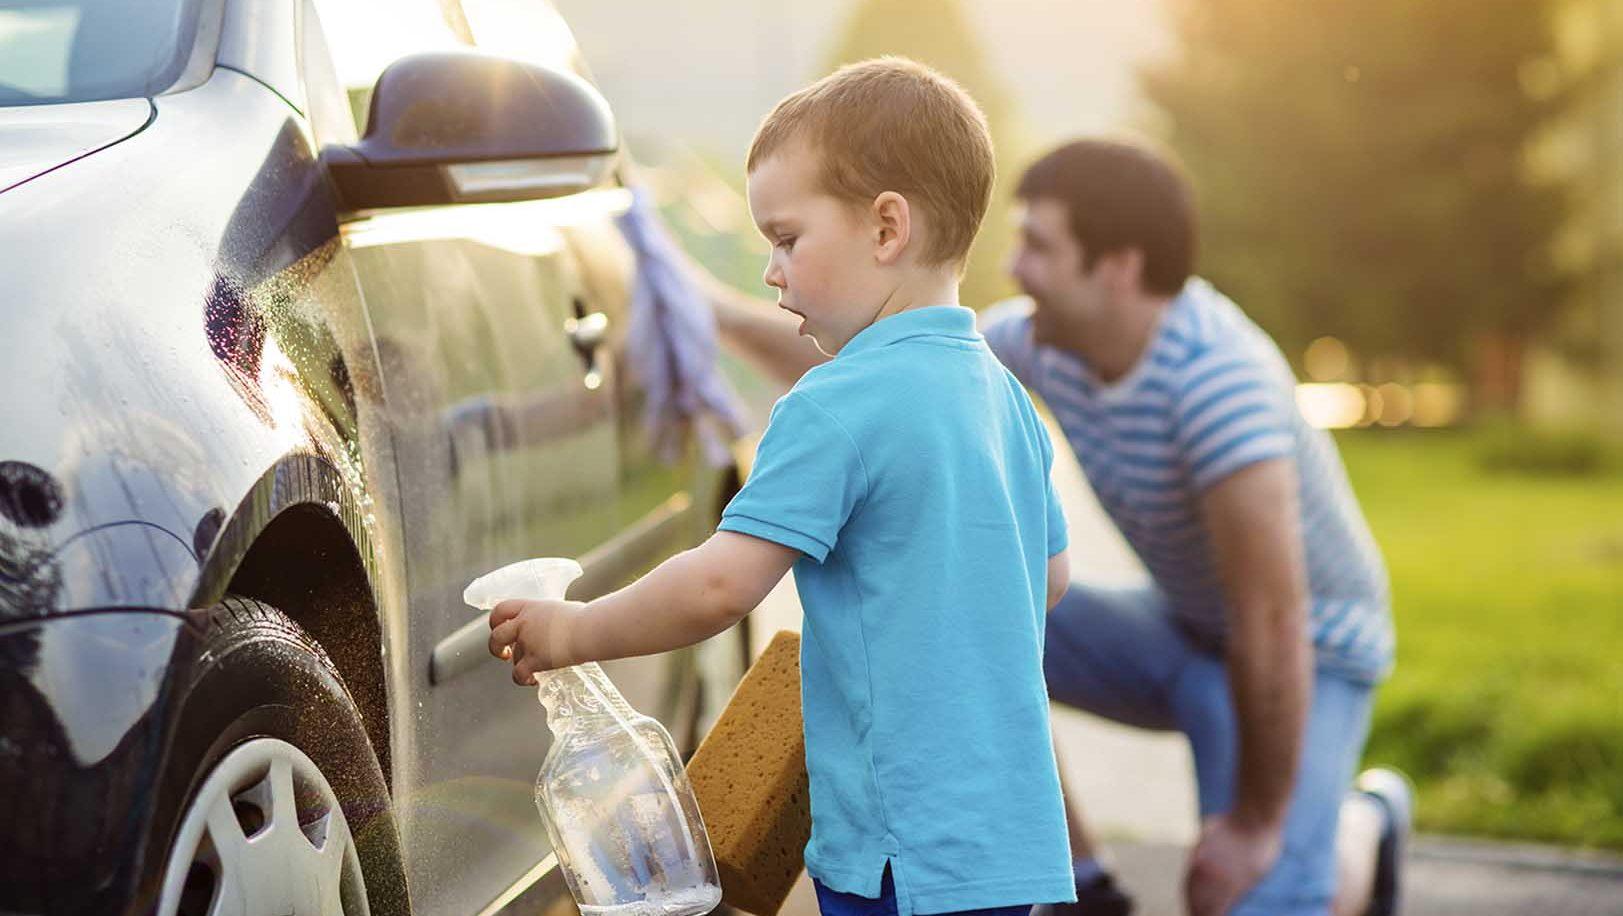 Teach Language at Home: Washing The Car